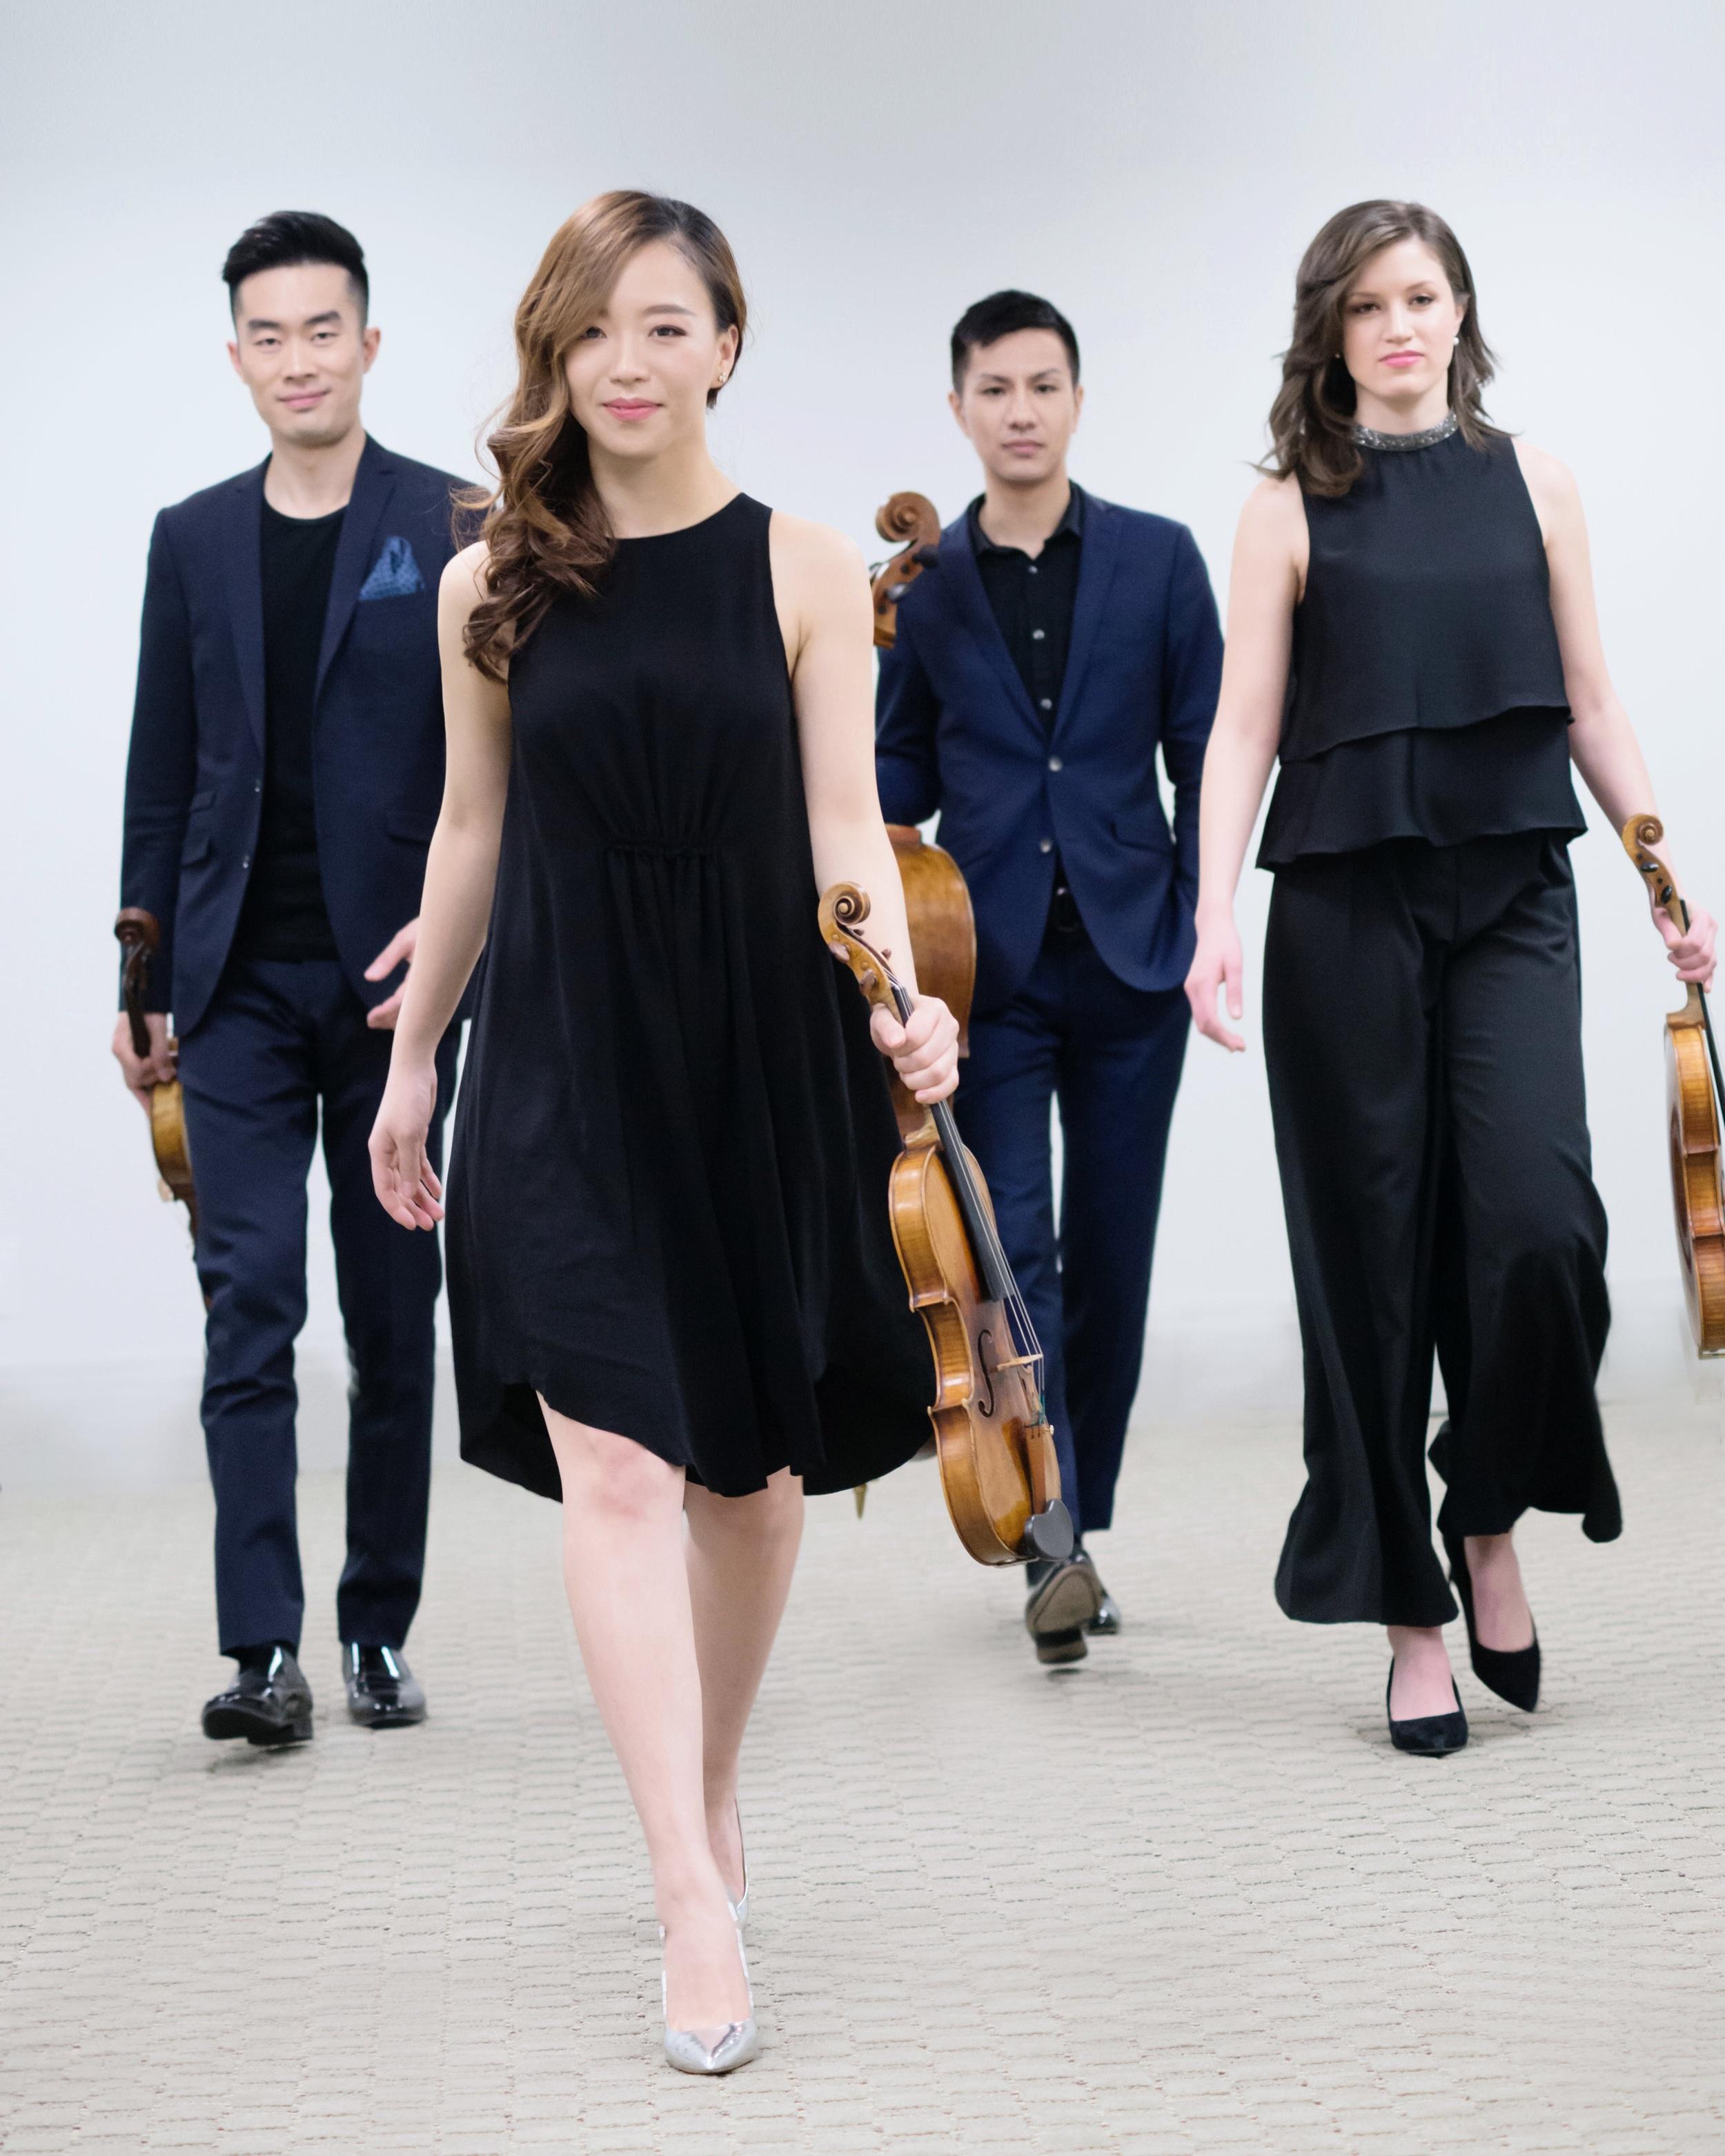 Rolston_String_Quartet_3.jpg